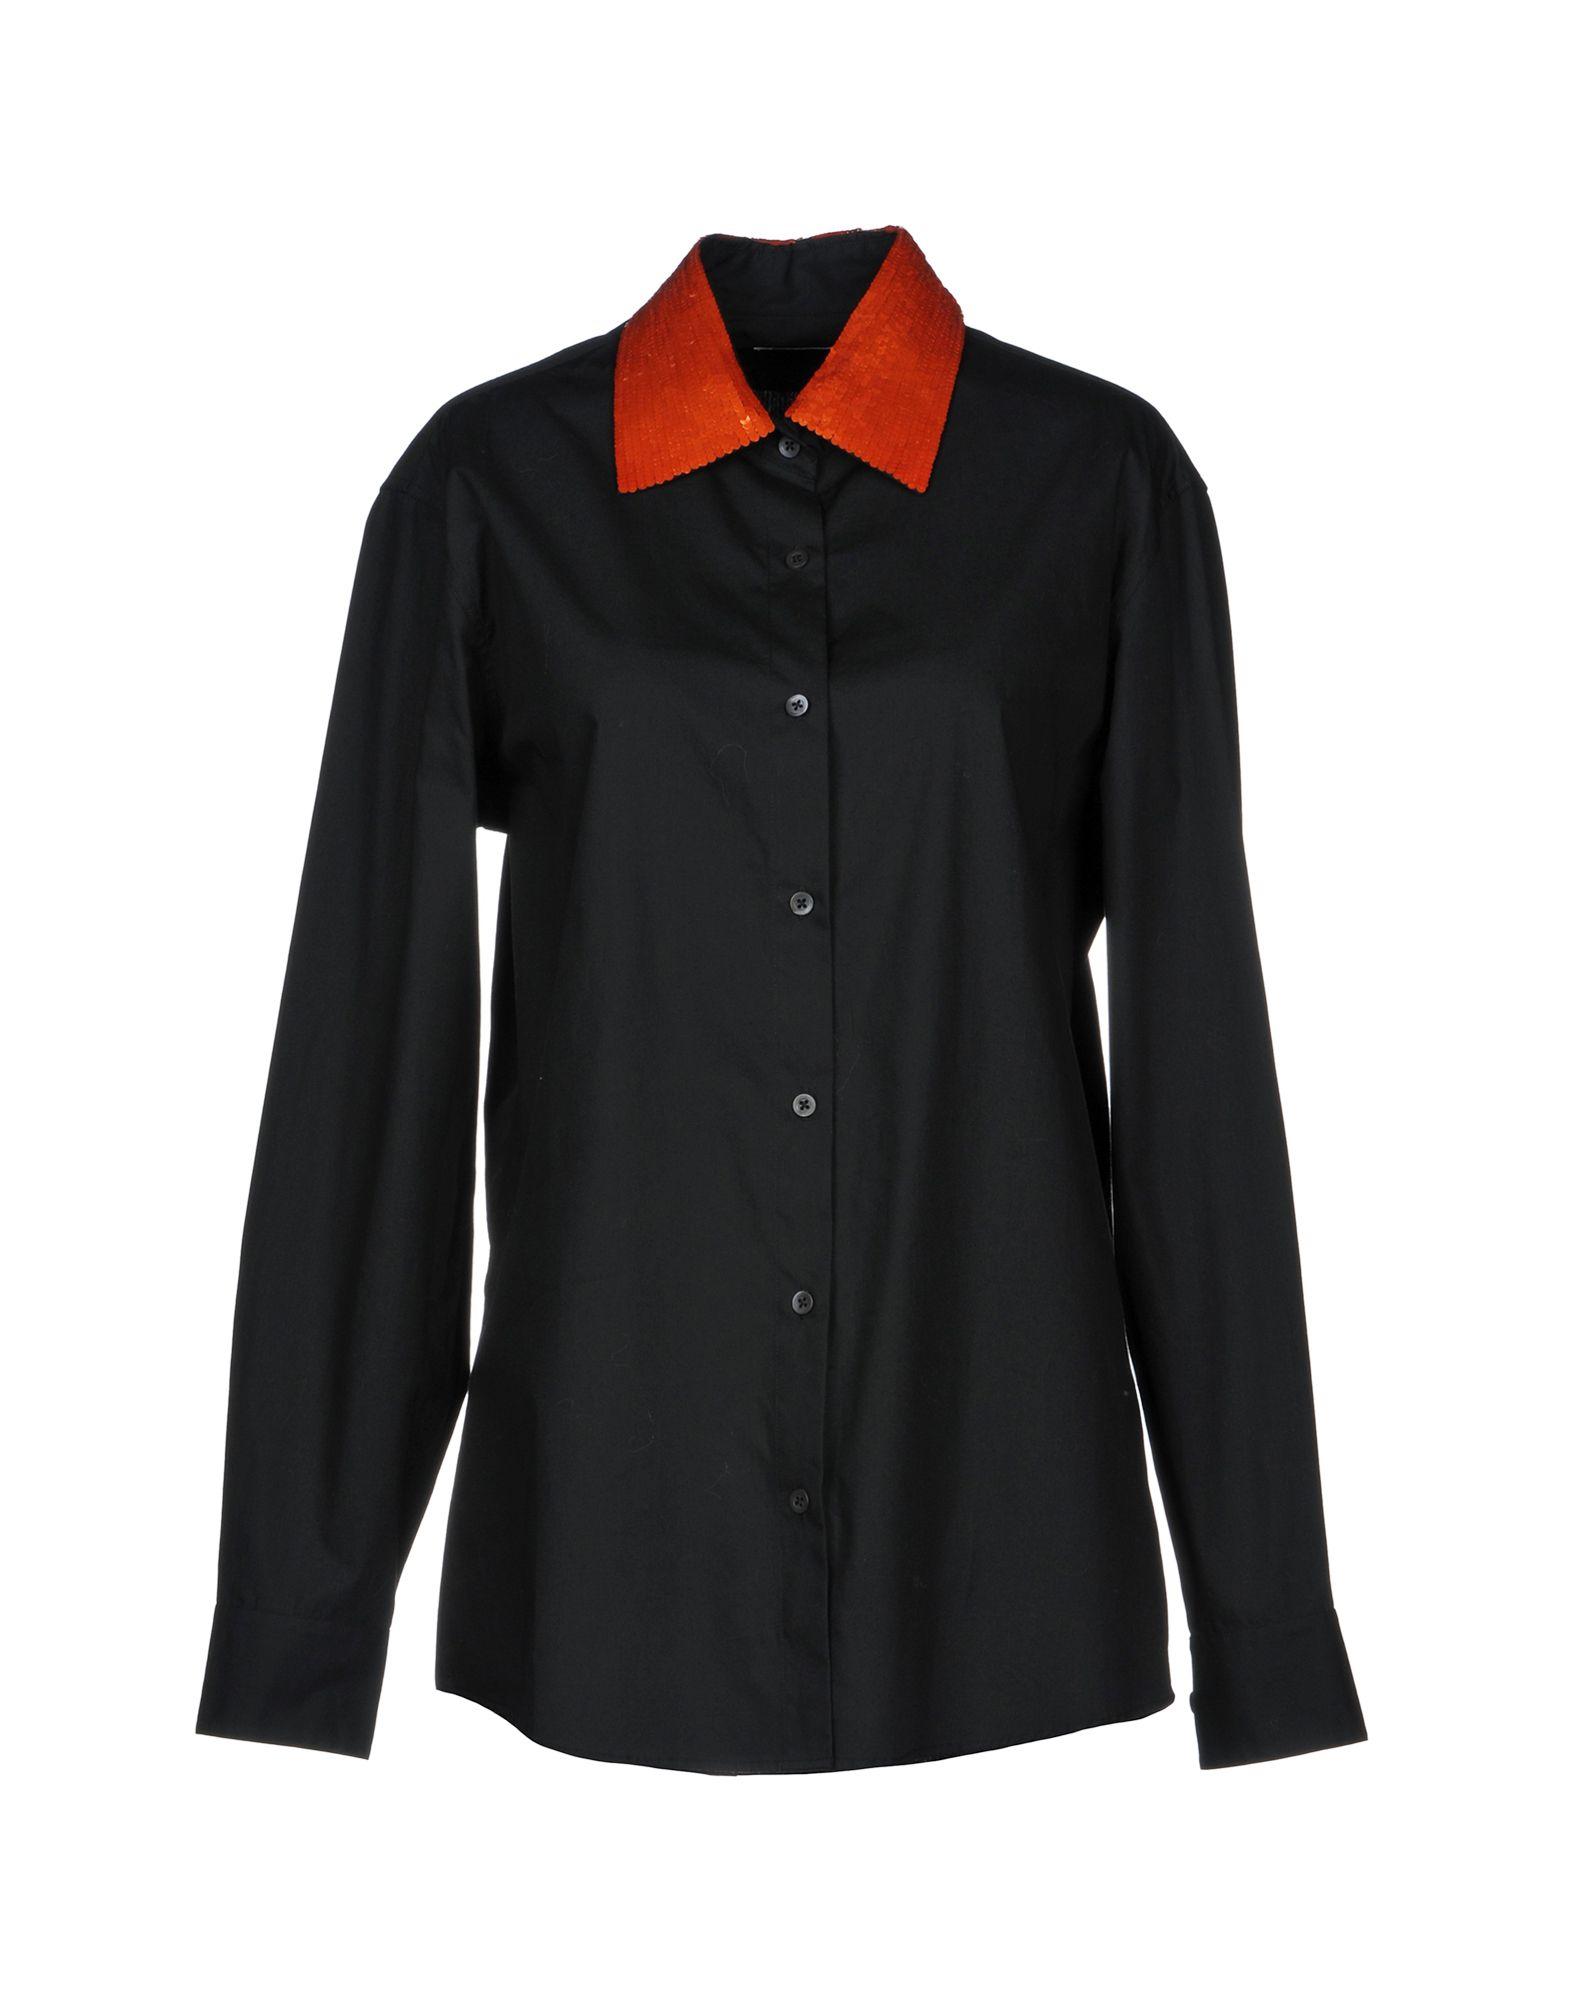 Camicie E Bluse Tinta Unita Dries Van Noten Donna - Acquista online su 7UxKw